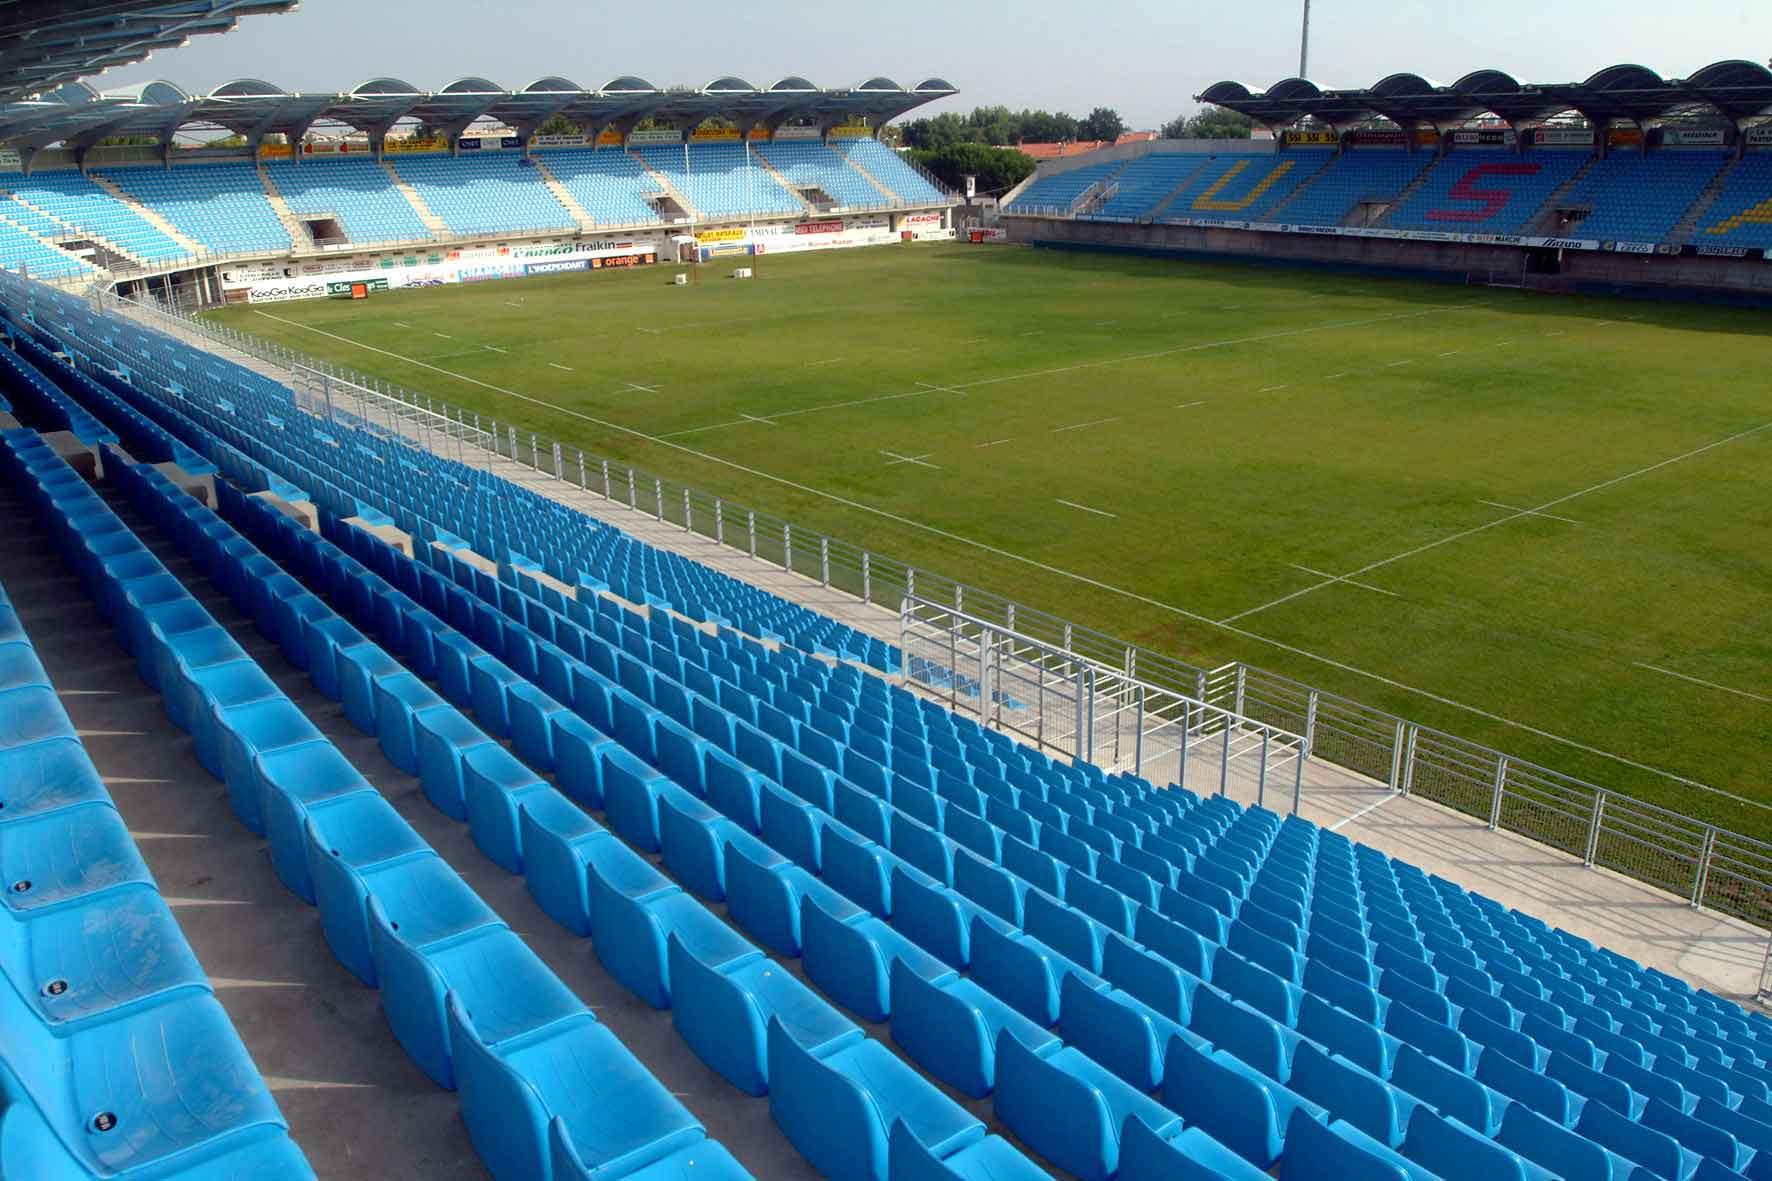 Stade Aimé-Giral